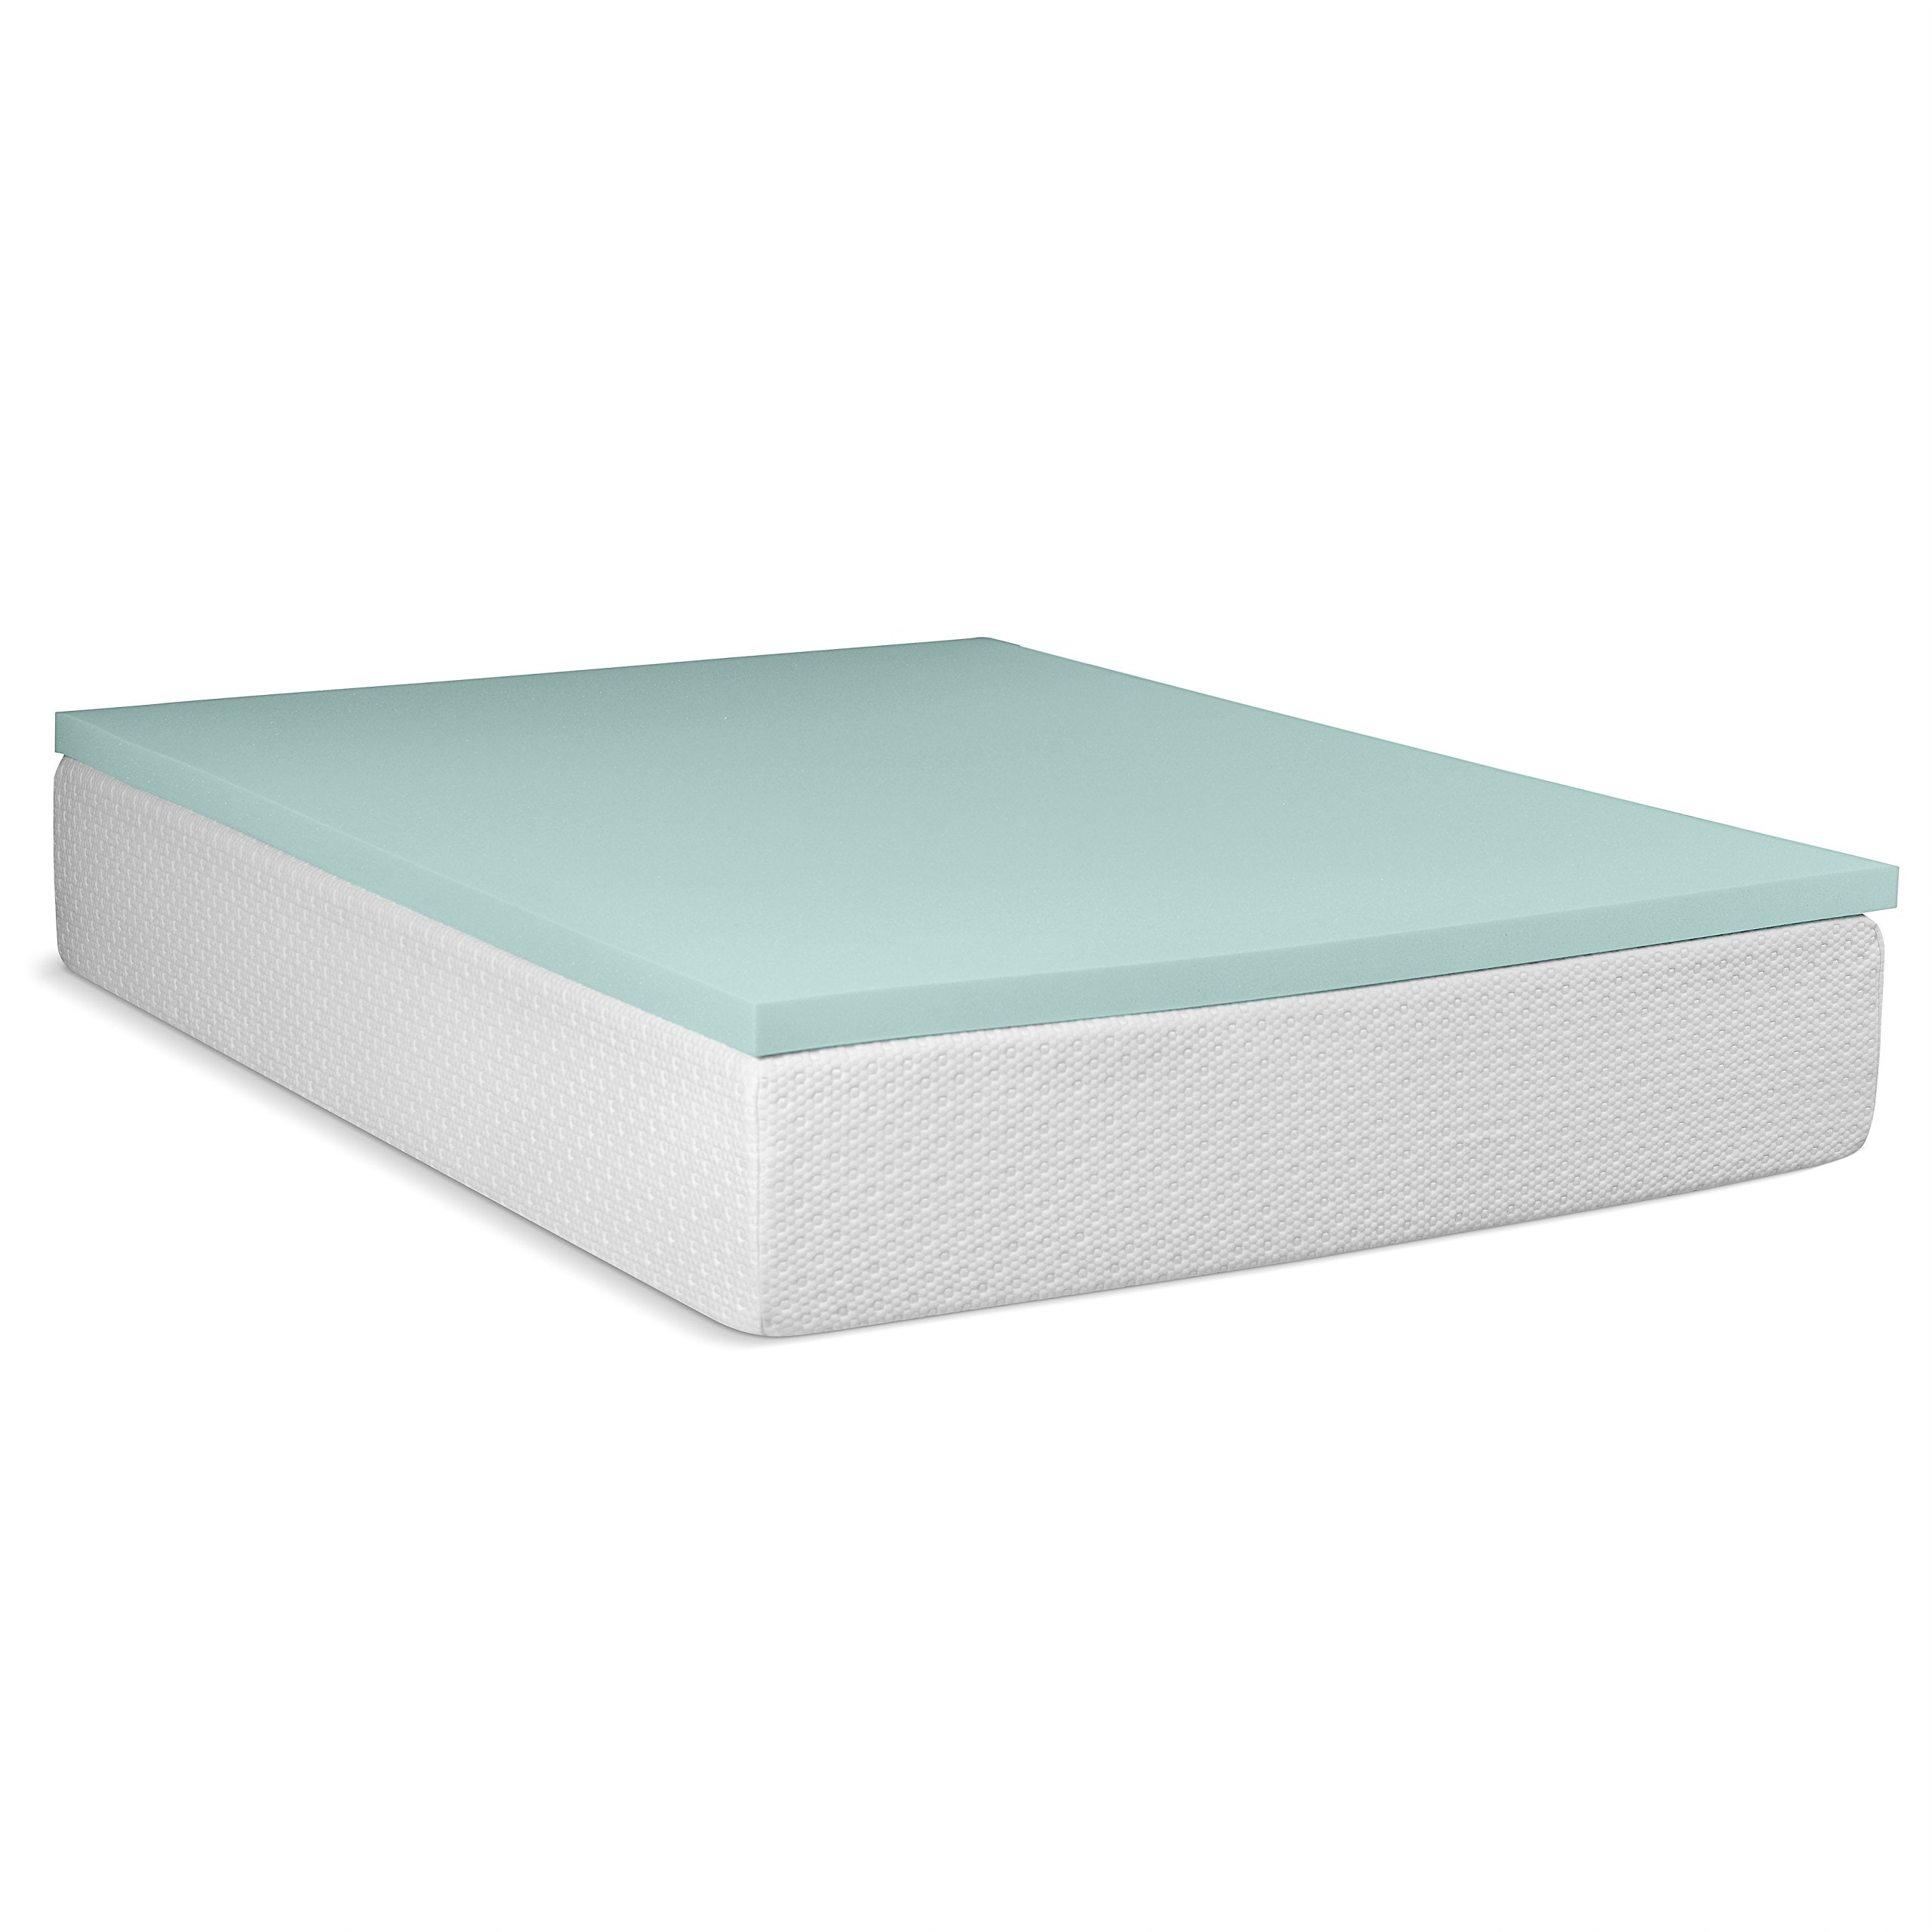 Serenia Sleep 3-Inch Density Viscoelastic Memory Foam Mattress Pad Bed Topper, California King